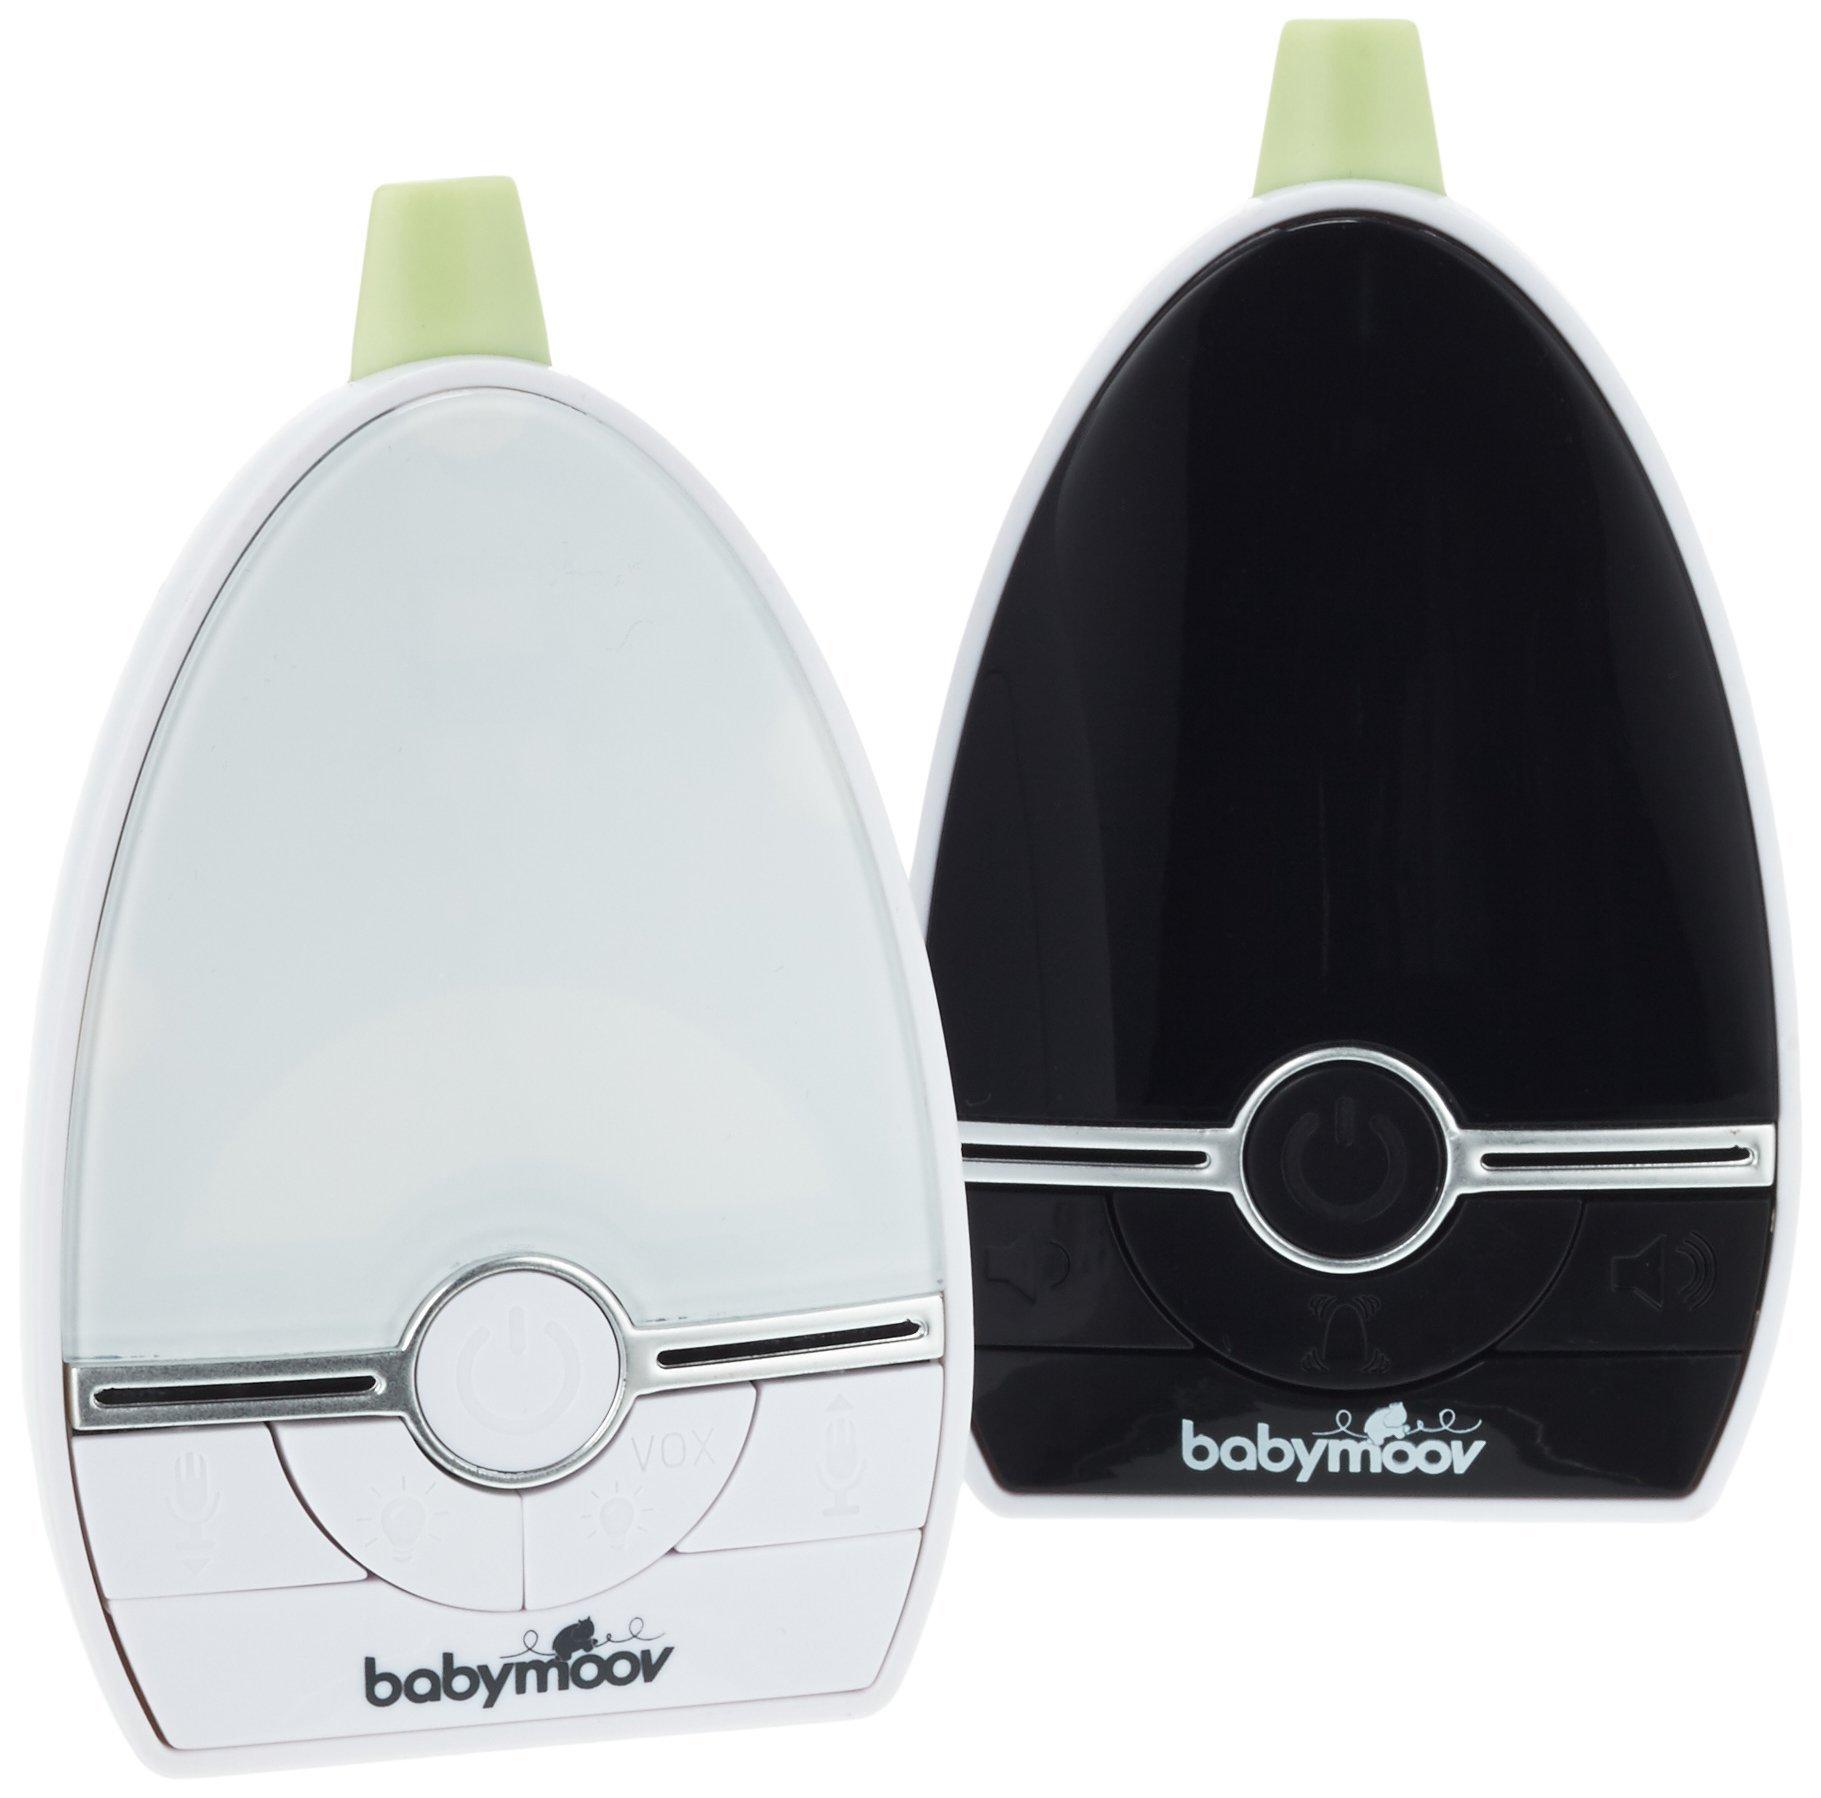 Babymoov Expert Care Digital Green Audio Baby Monitor (UK Plug) BABYMOOV 1000 m range VOX function (voice activation mode) Three alarms: Acoustic/visual/vibration 2